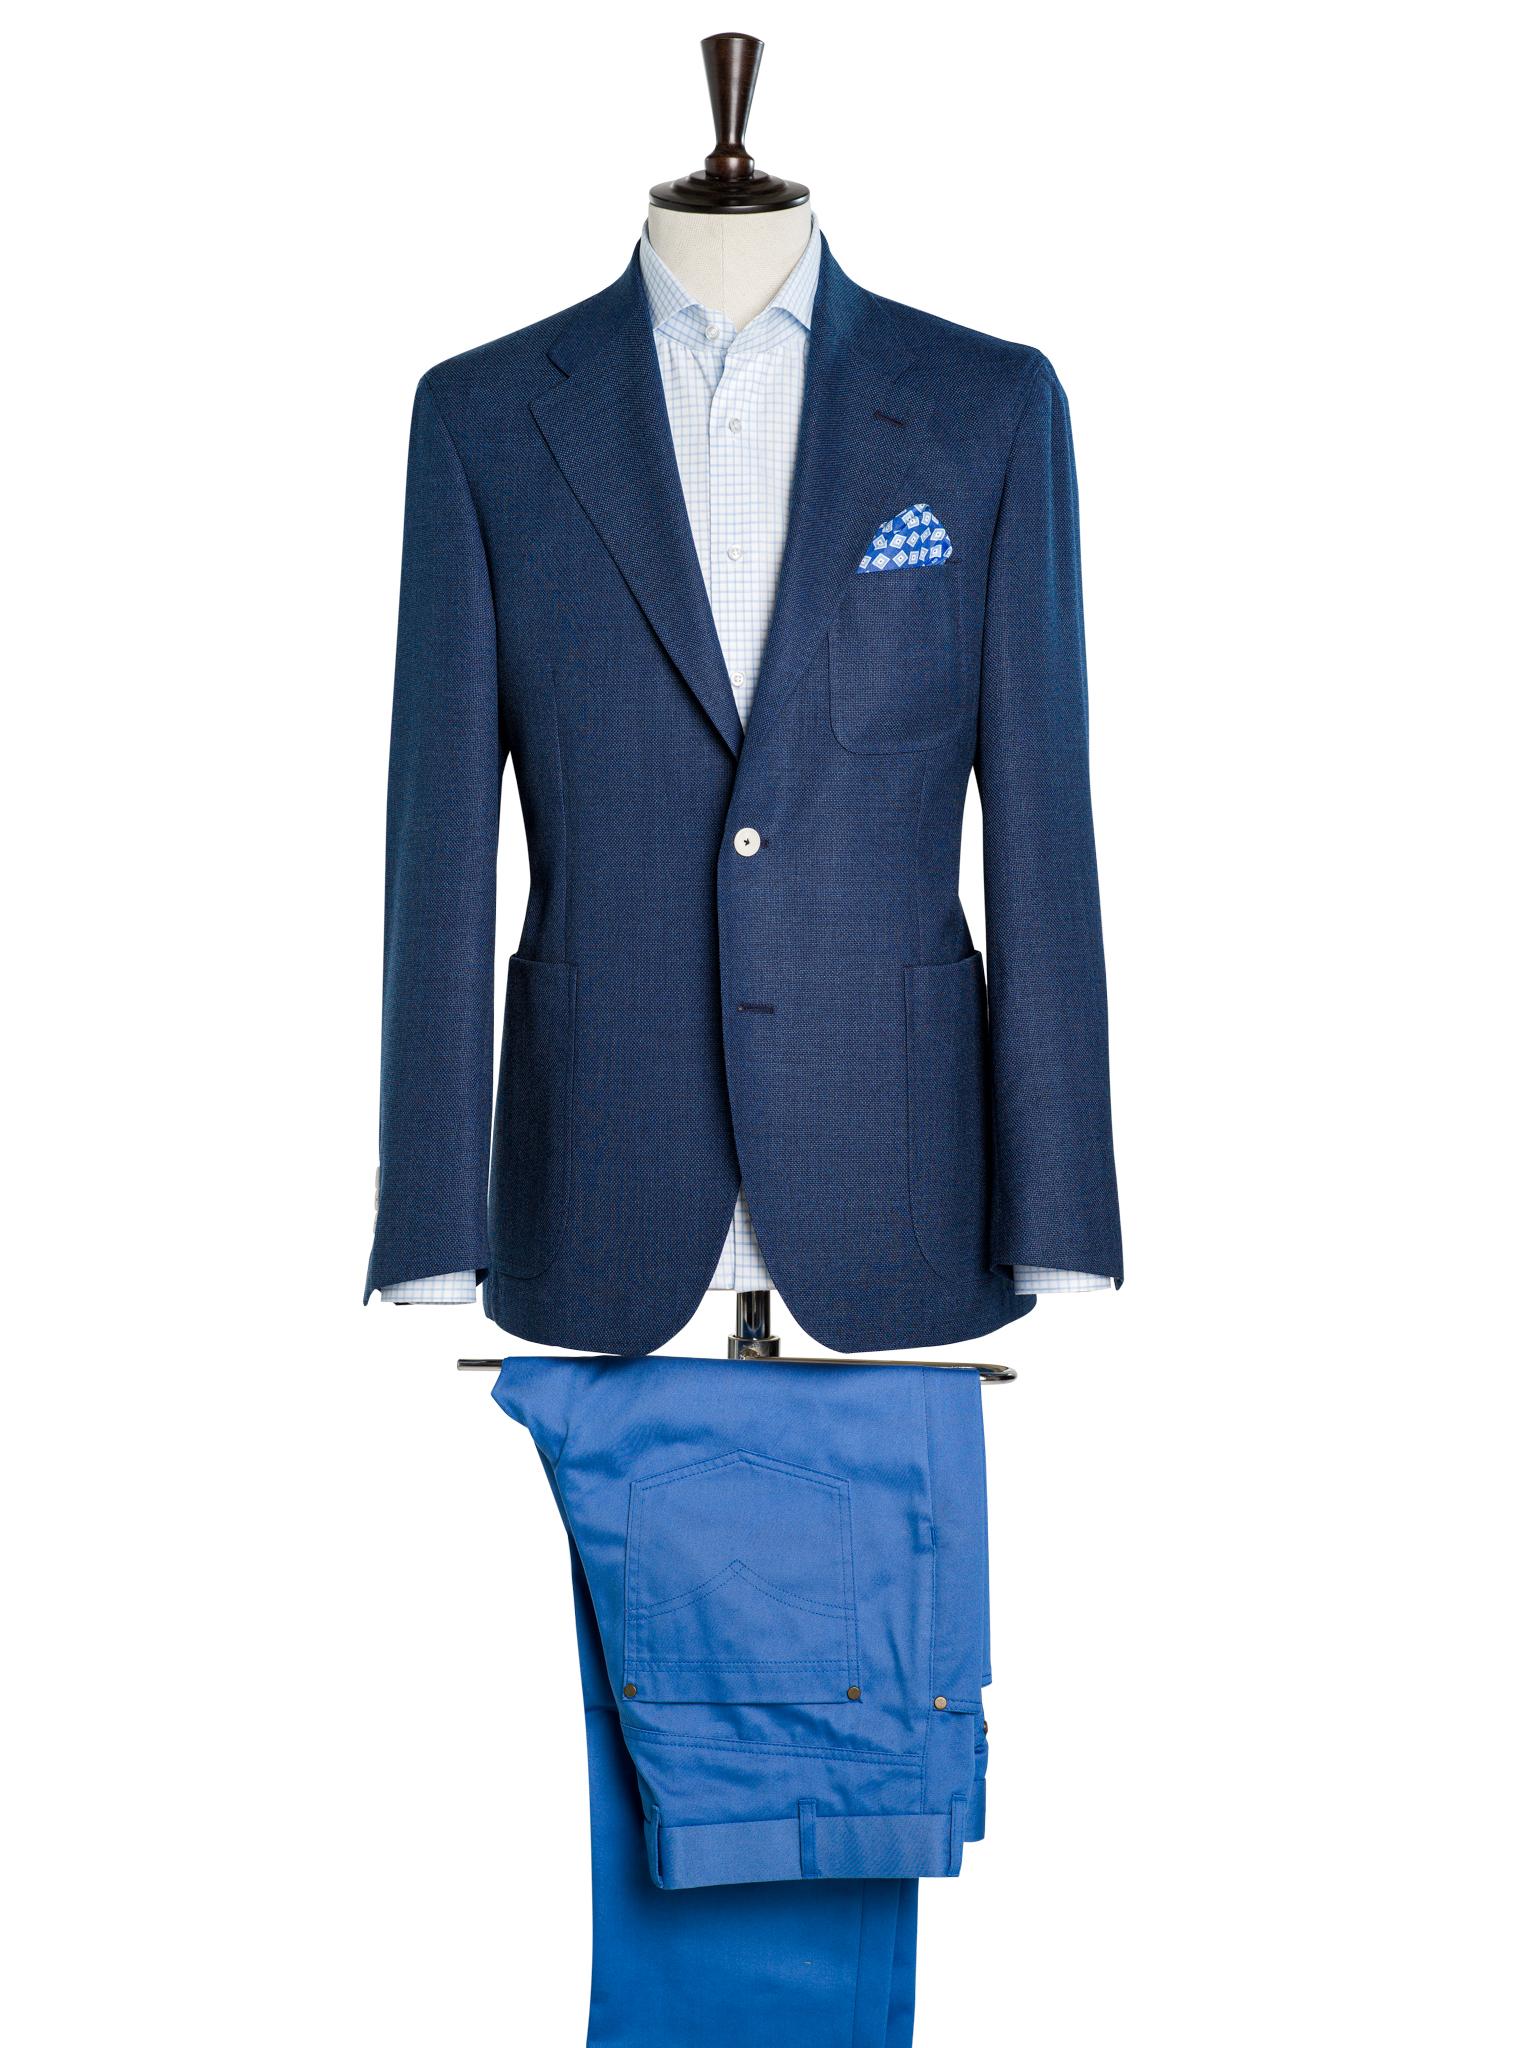 Casual Outfit Sakko Hemd Chino nach Maß Wien.jpg